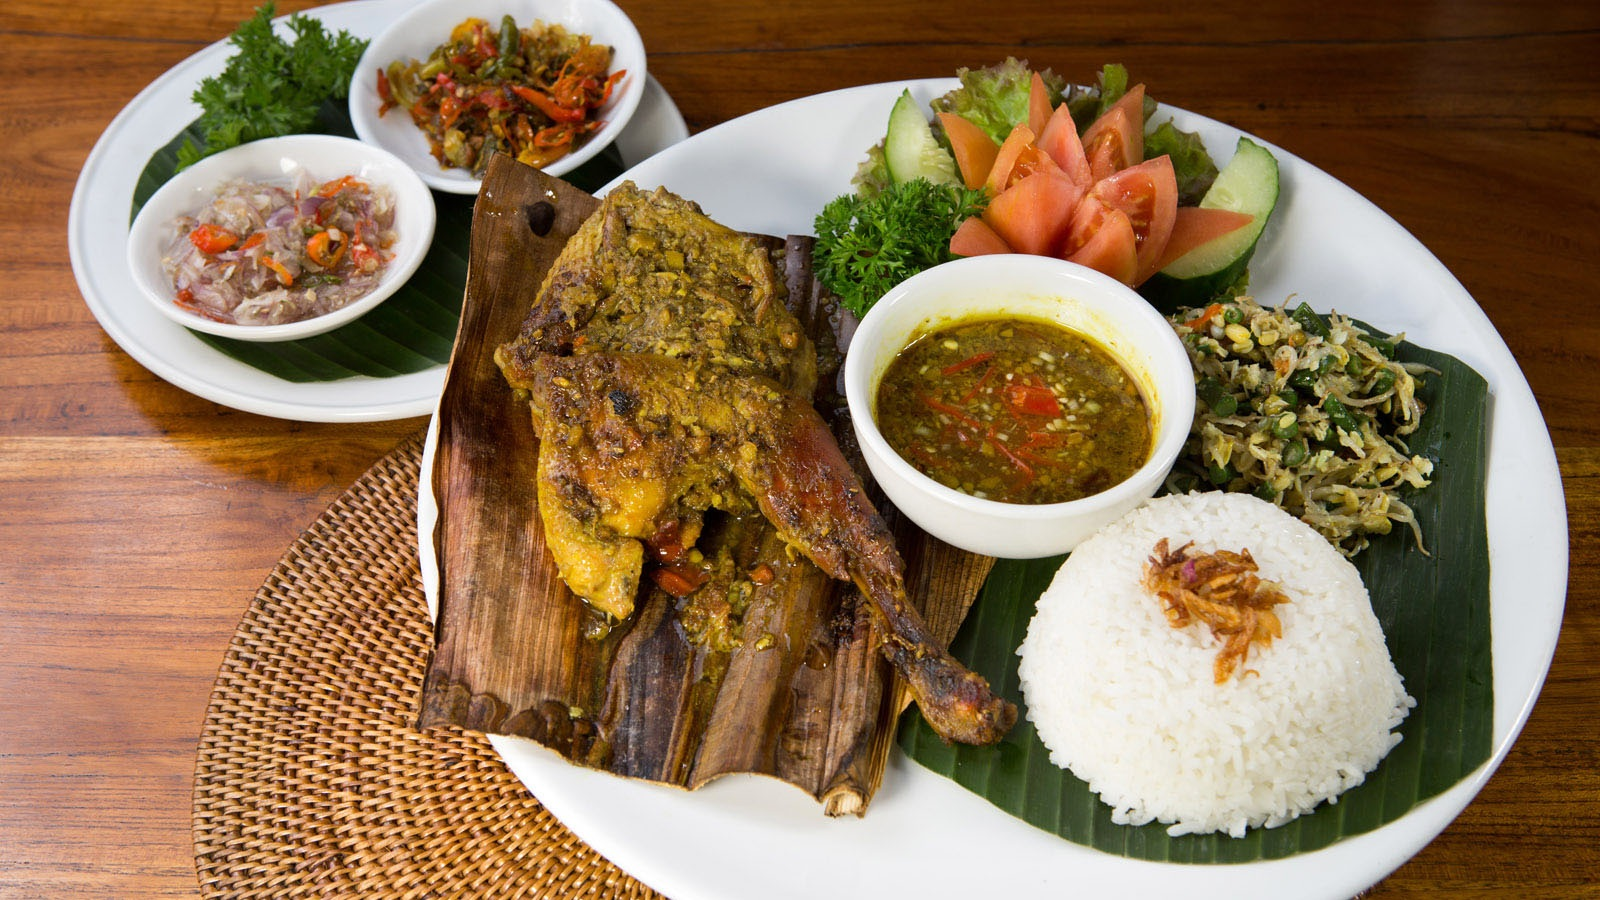 Bebek Betutu Khas Gianyar, Kuliner Bali Istimewa yang Butuh Waktu Masak 12 Jam